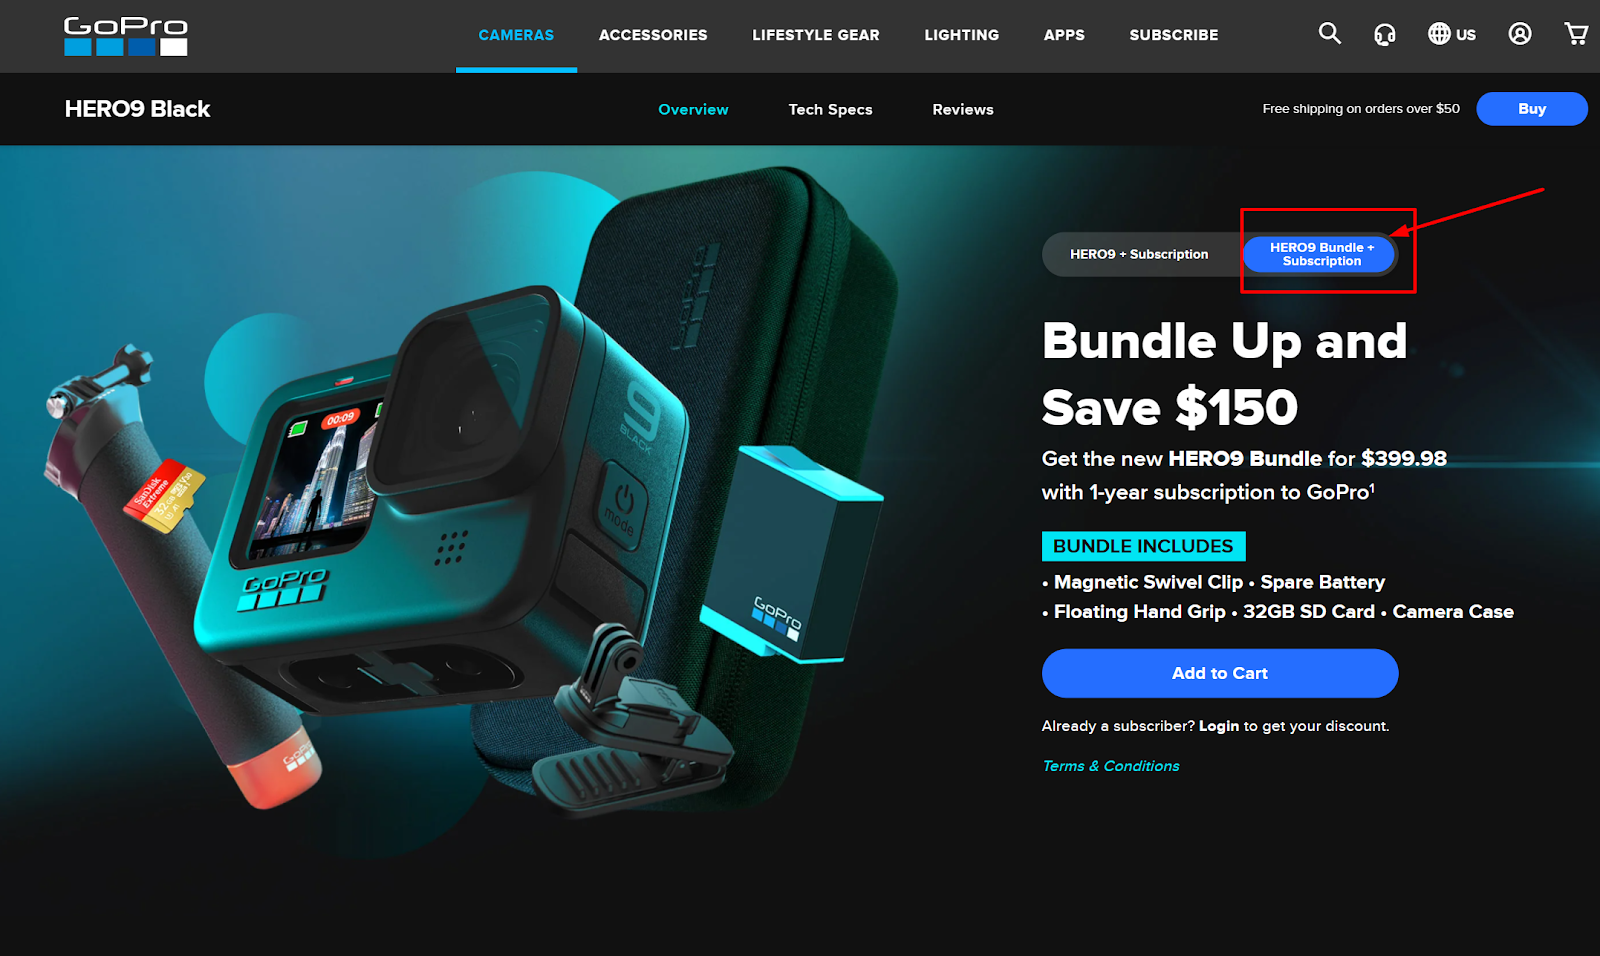 GoPro product bundles